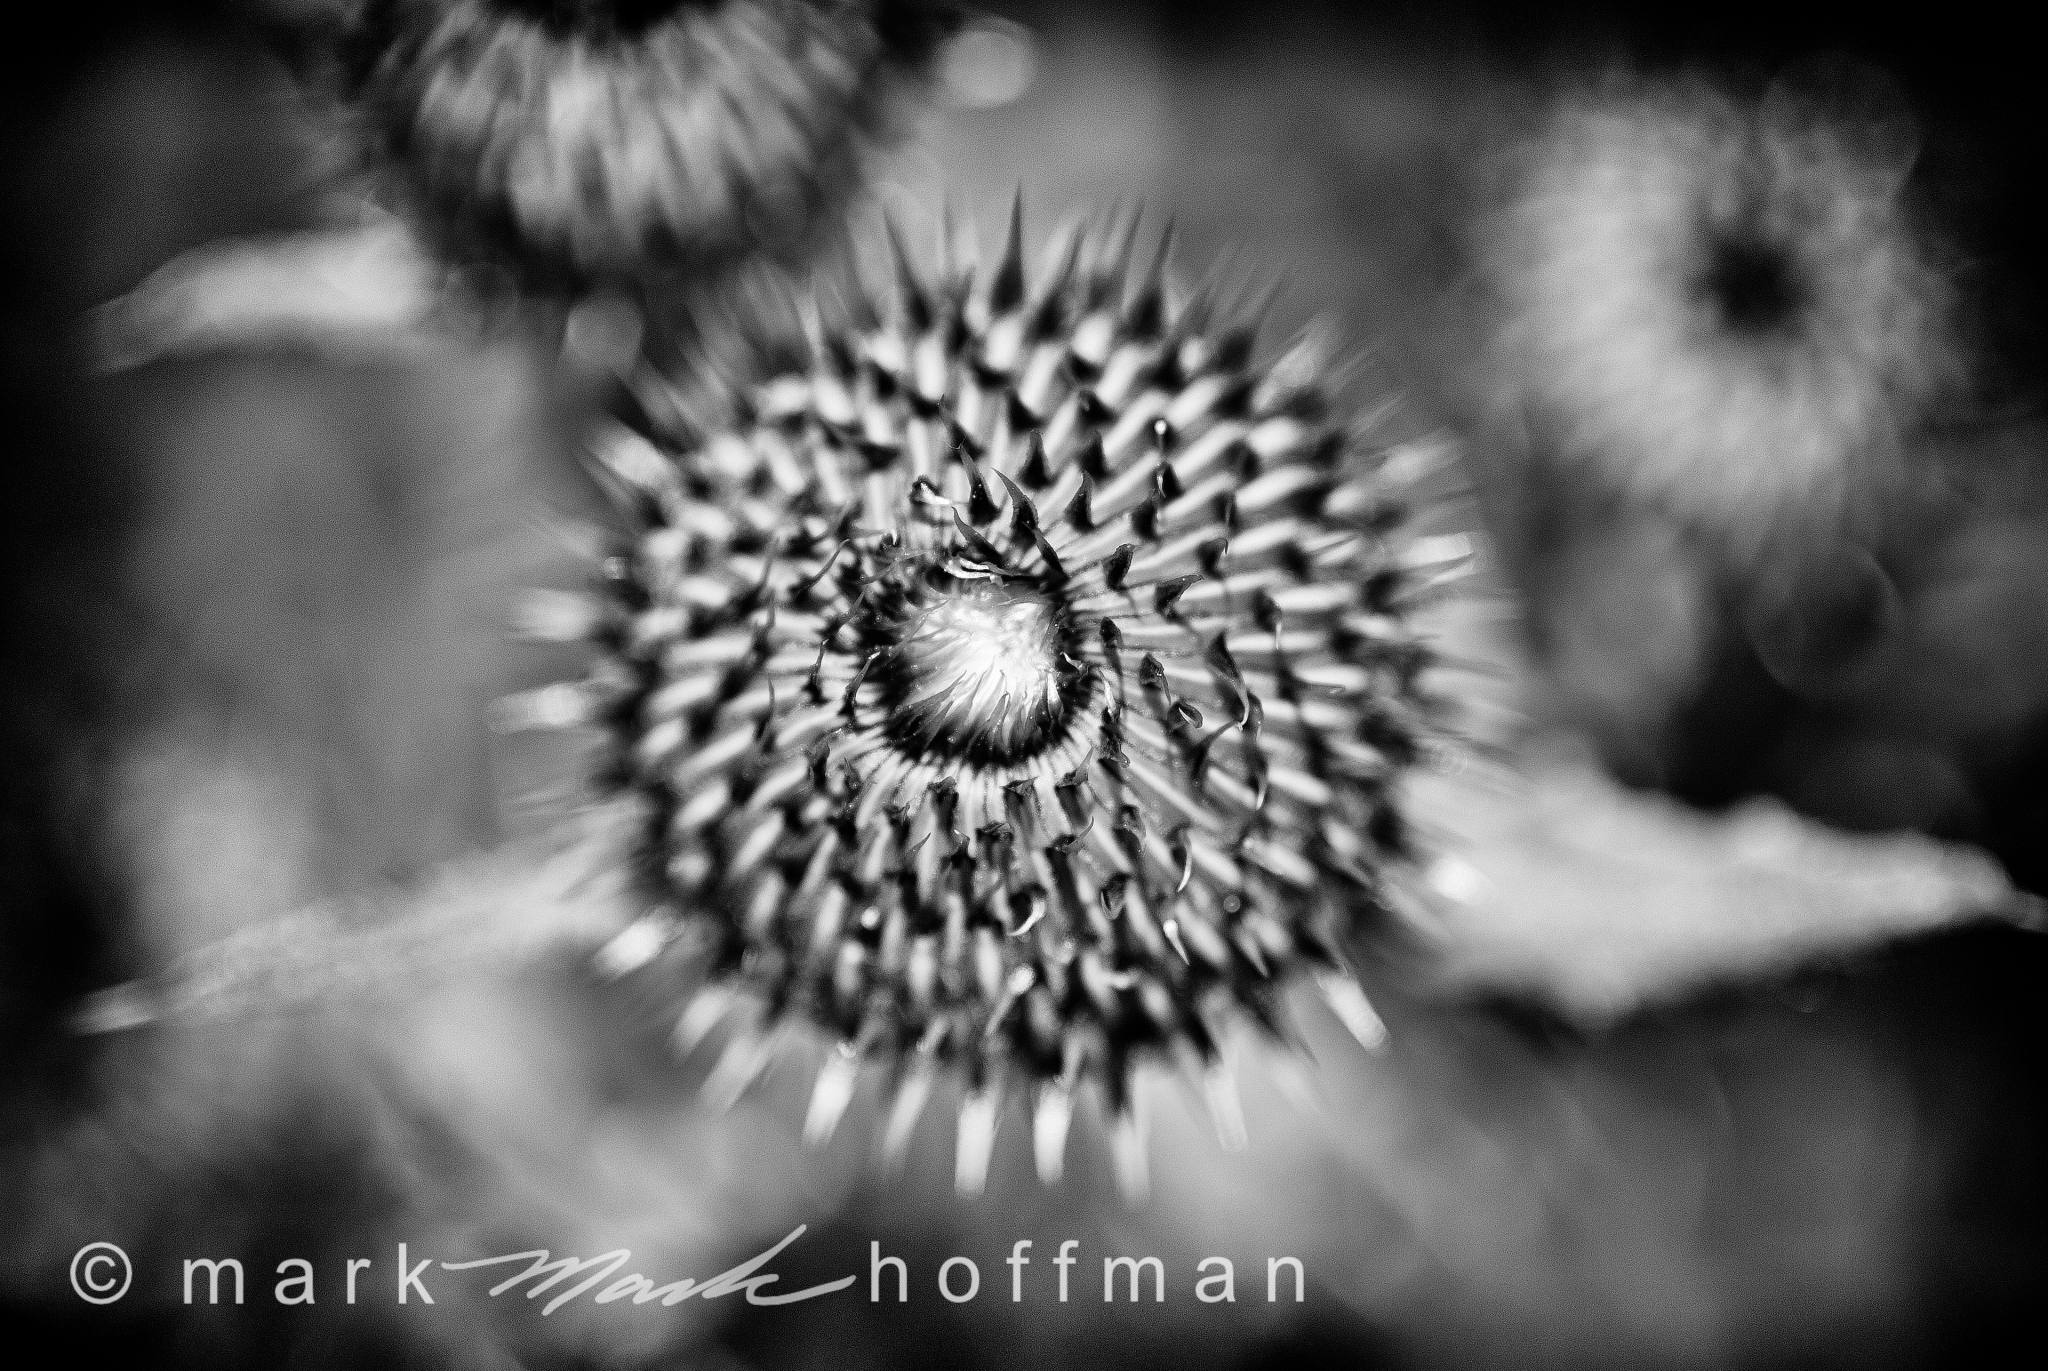 Mark_Hoffman_ND24694-Edit_cap1_var1.jpg